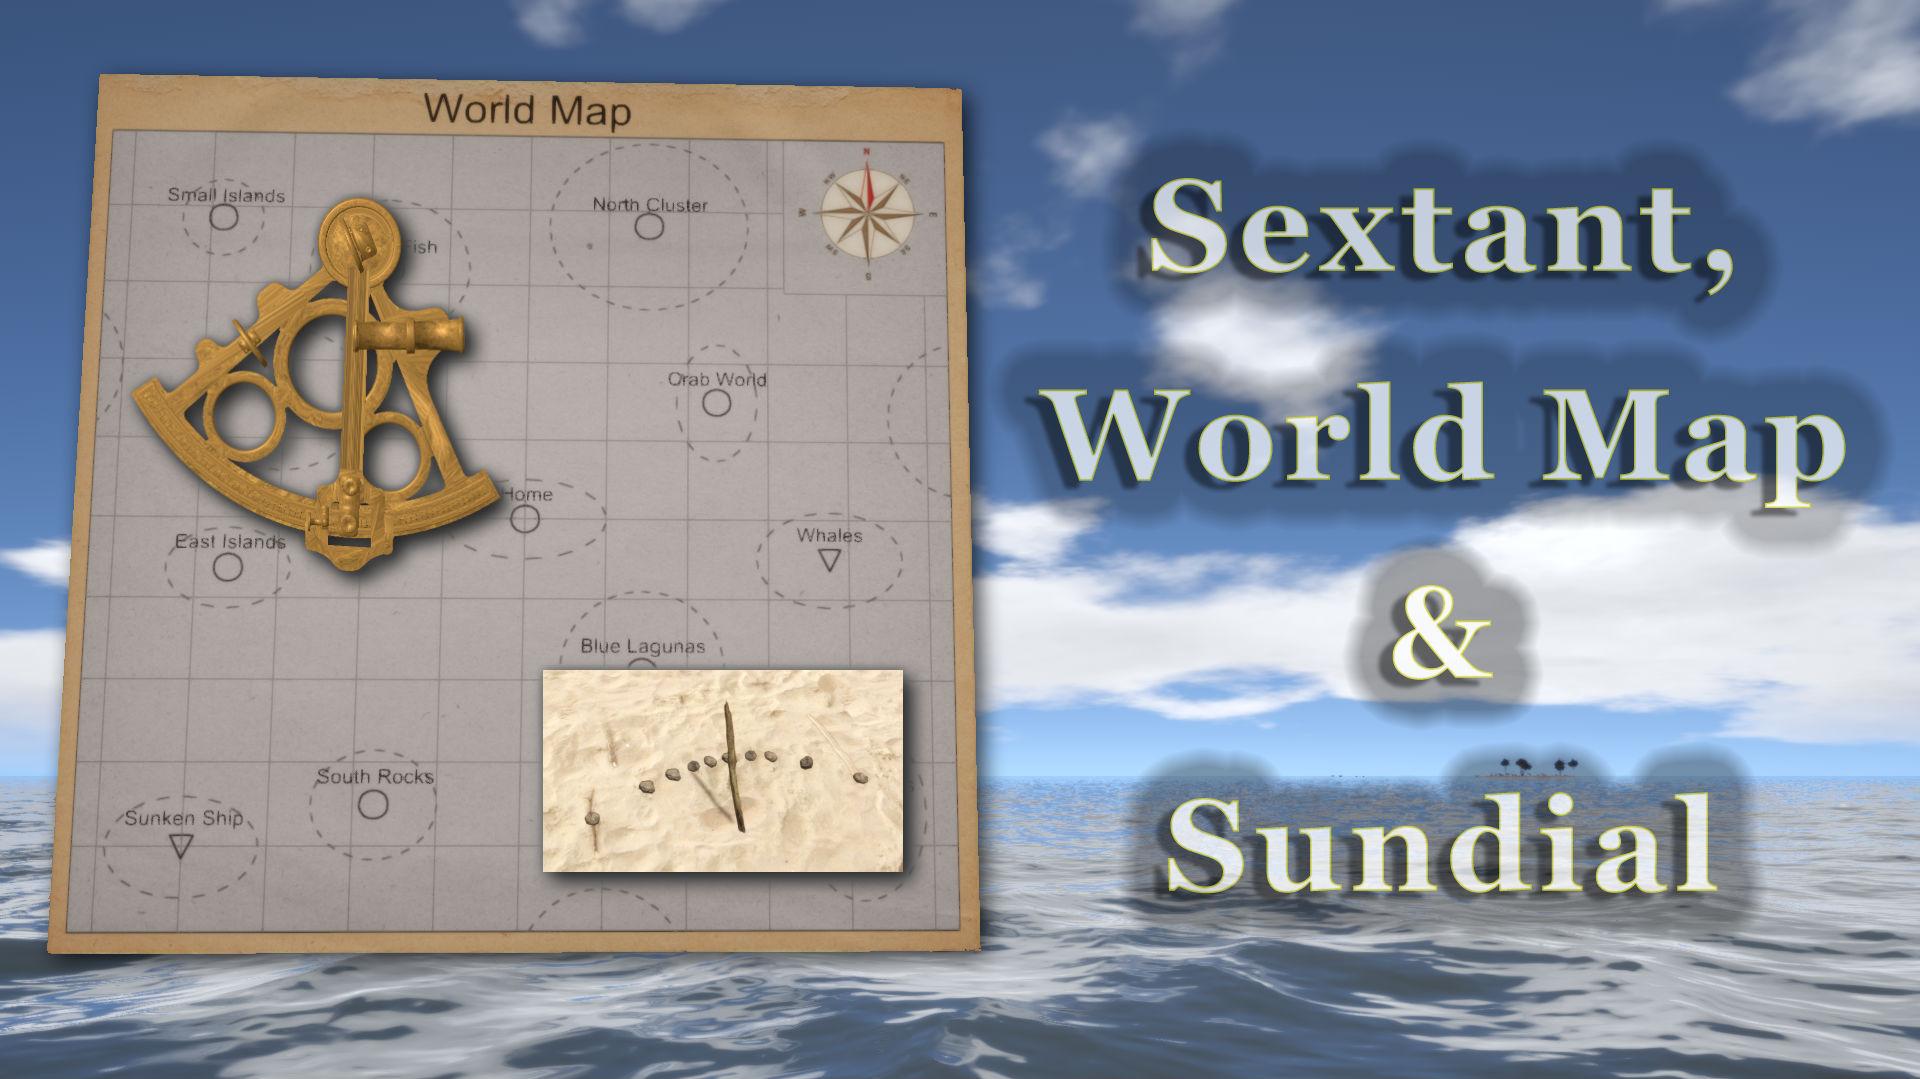 LiP_Sextant_WorldMap_Sundial